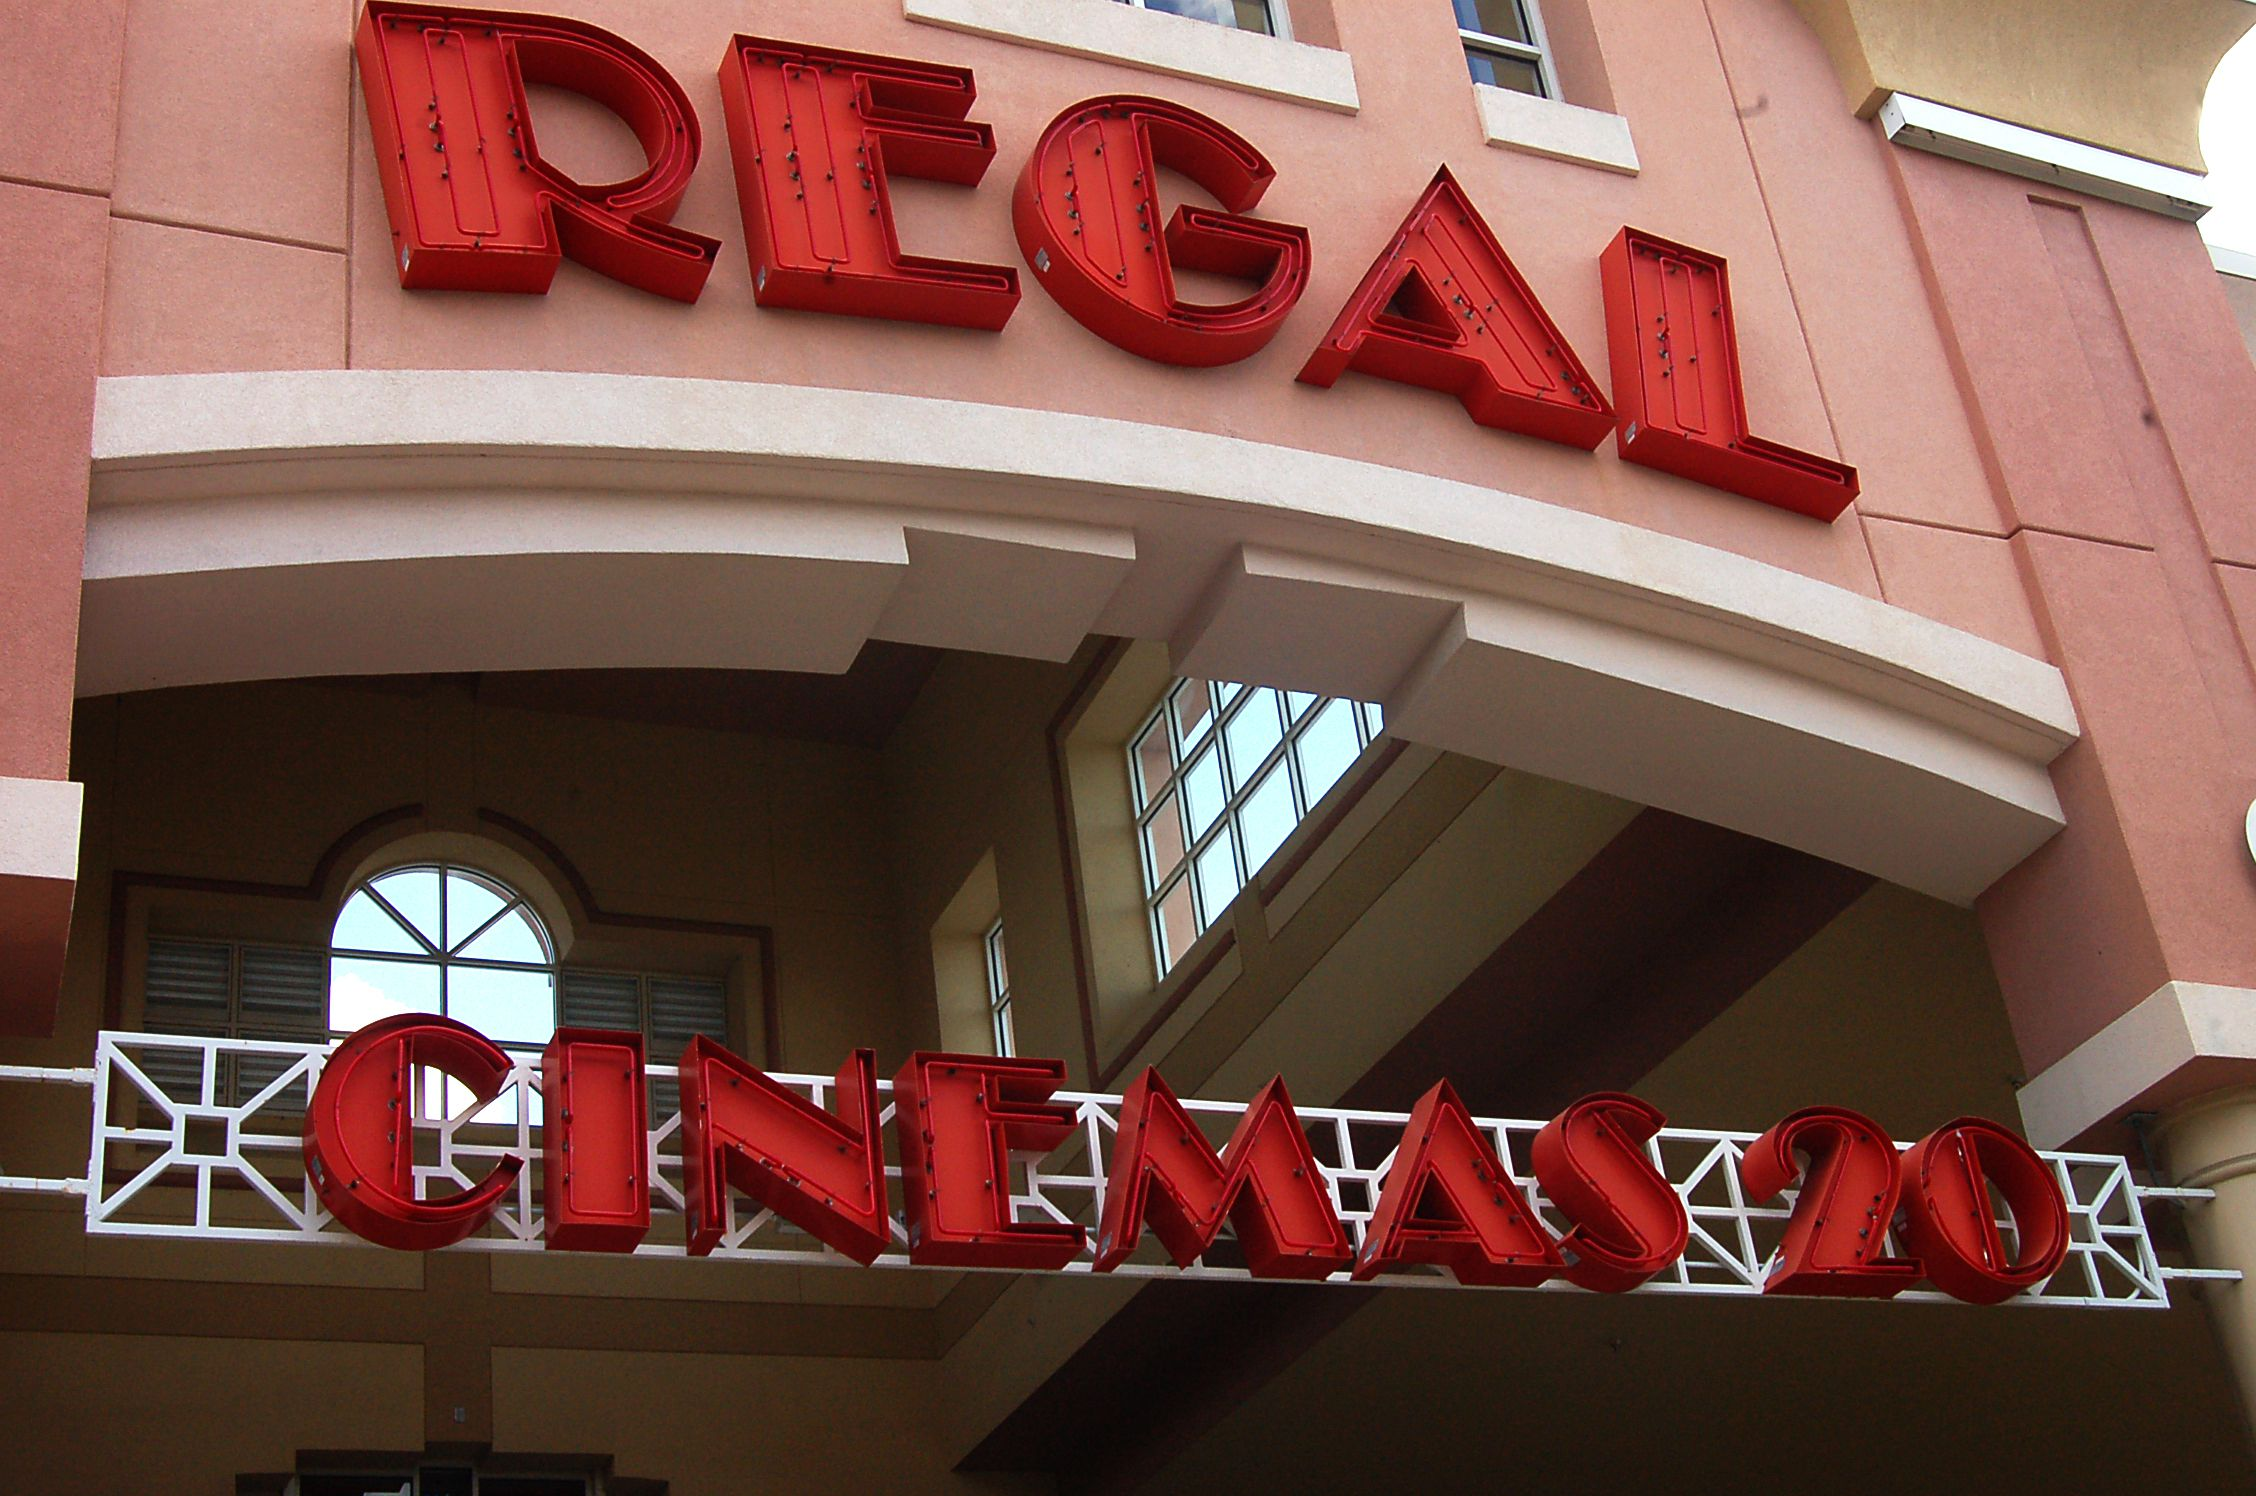 Fullsize Of Regal Chula Vista